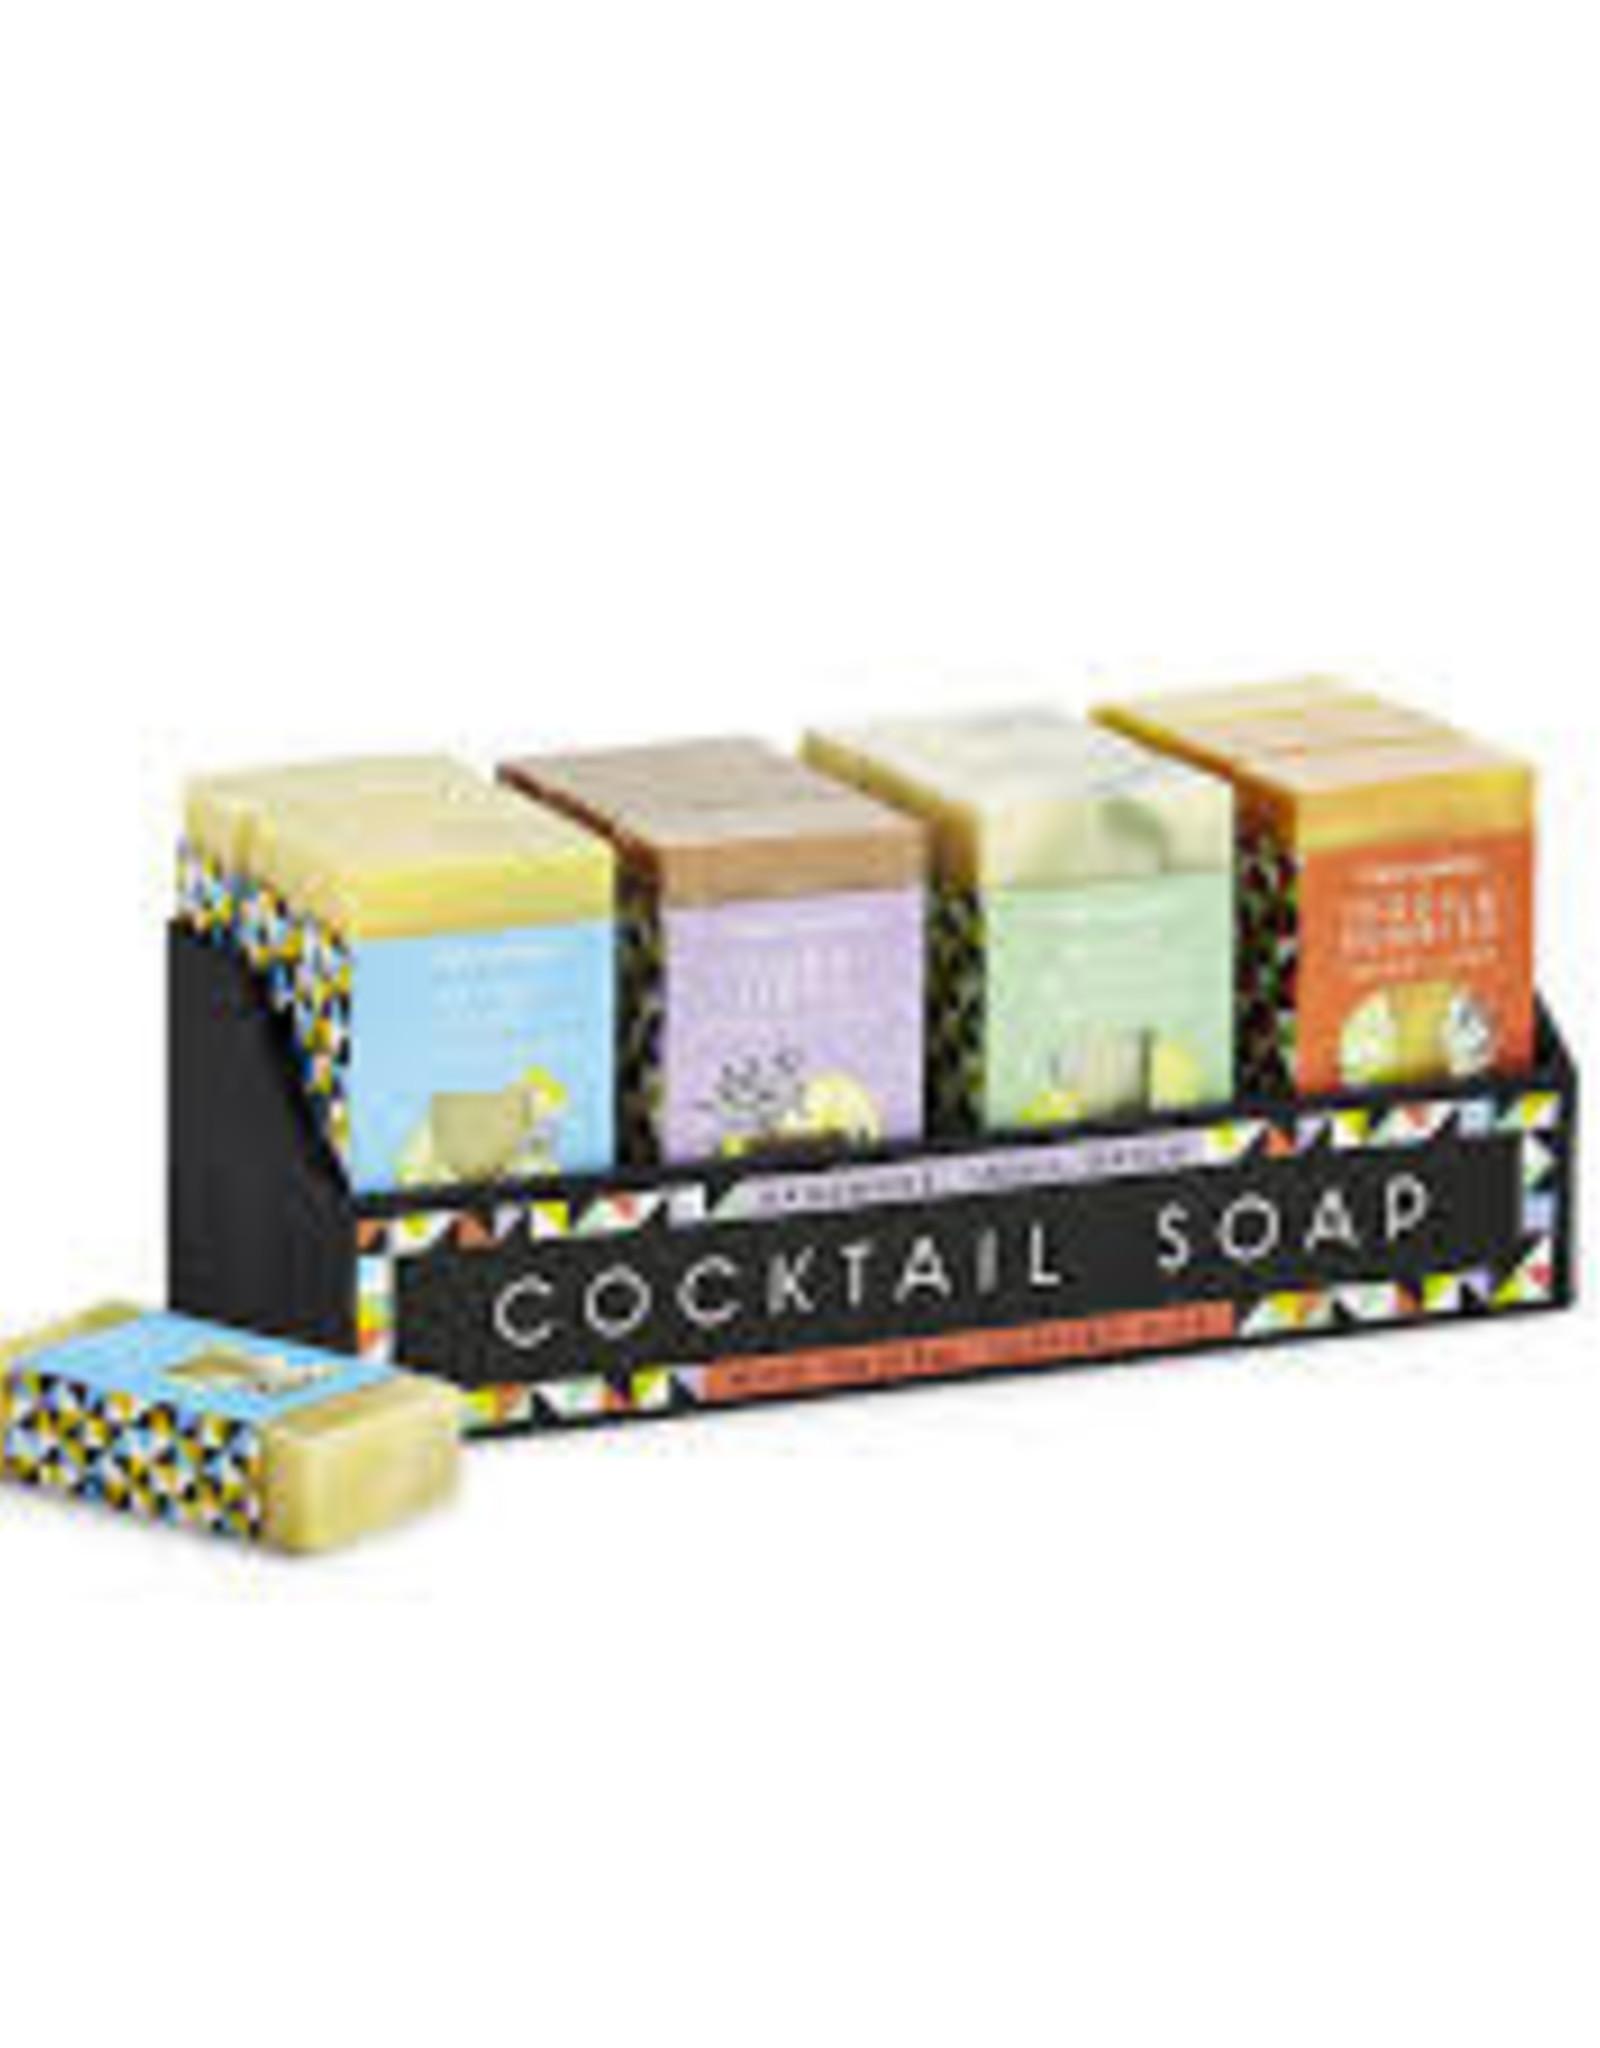 Cocktail Hour Soap, Tequila Sunrise